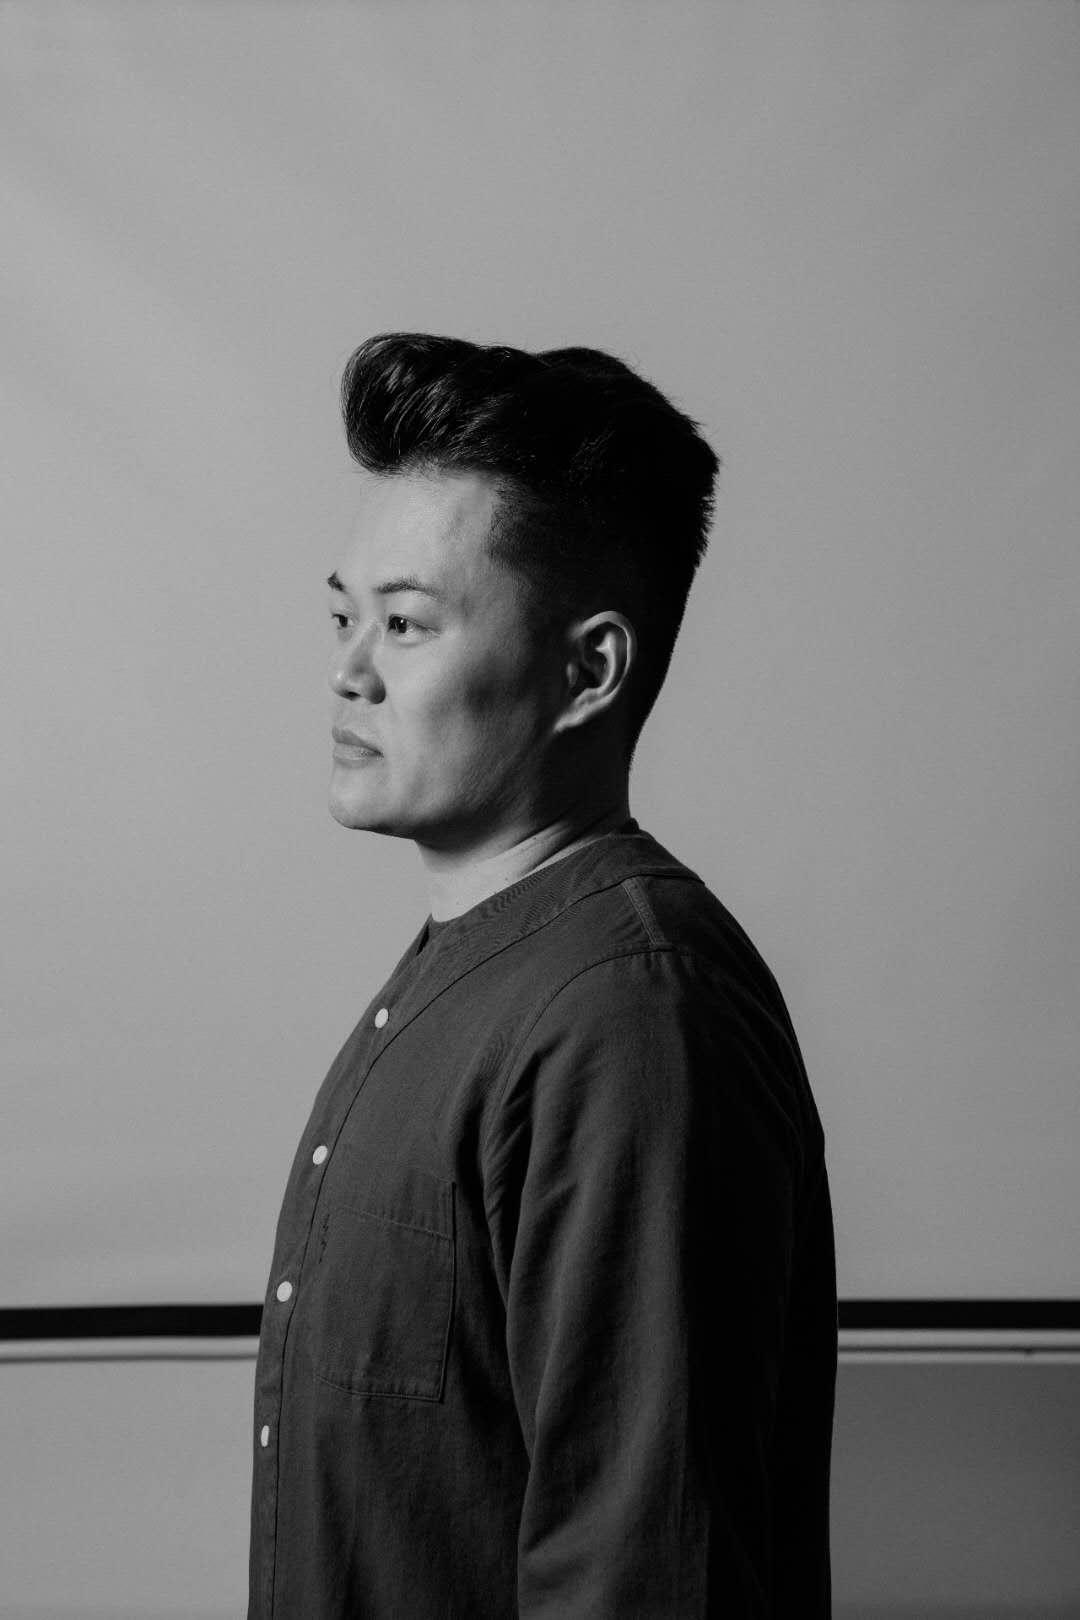 Alexander Lu - 创始人/平面设计/纯美术导师